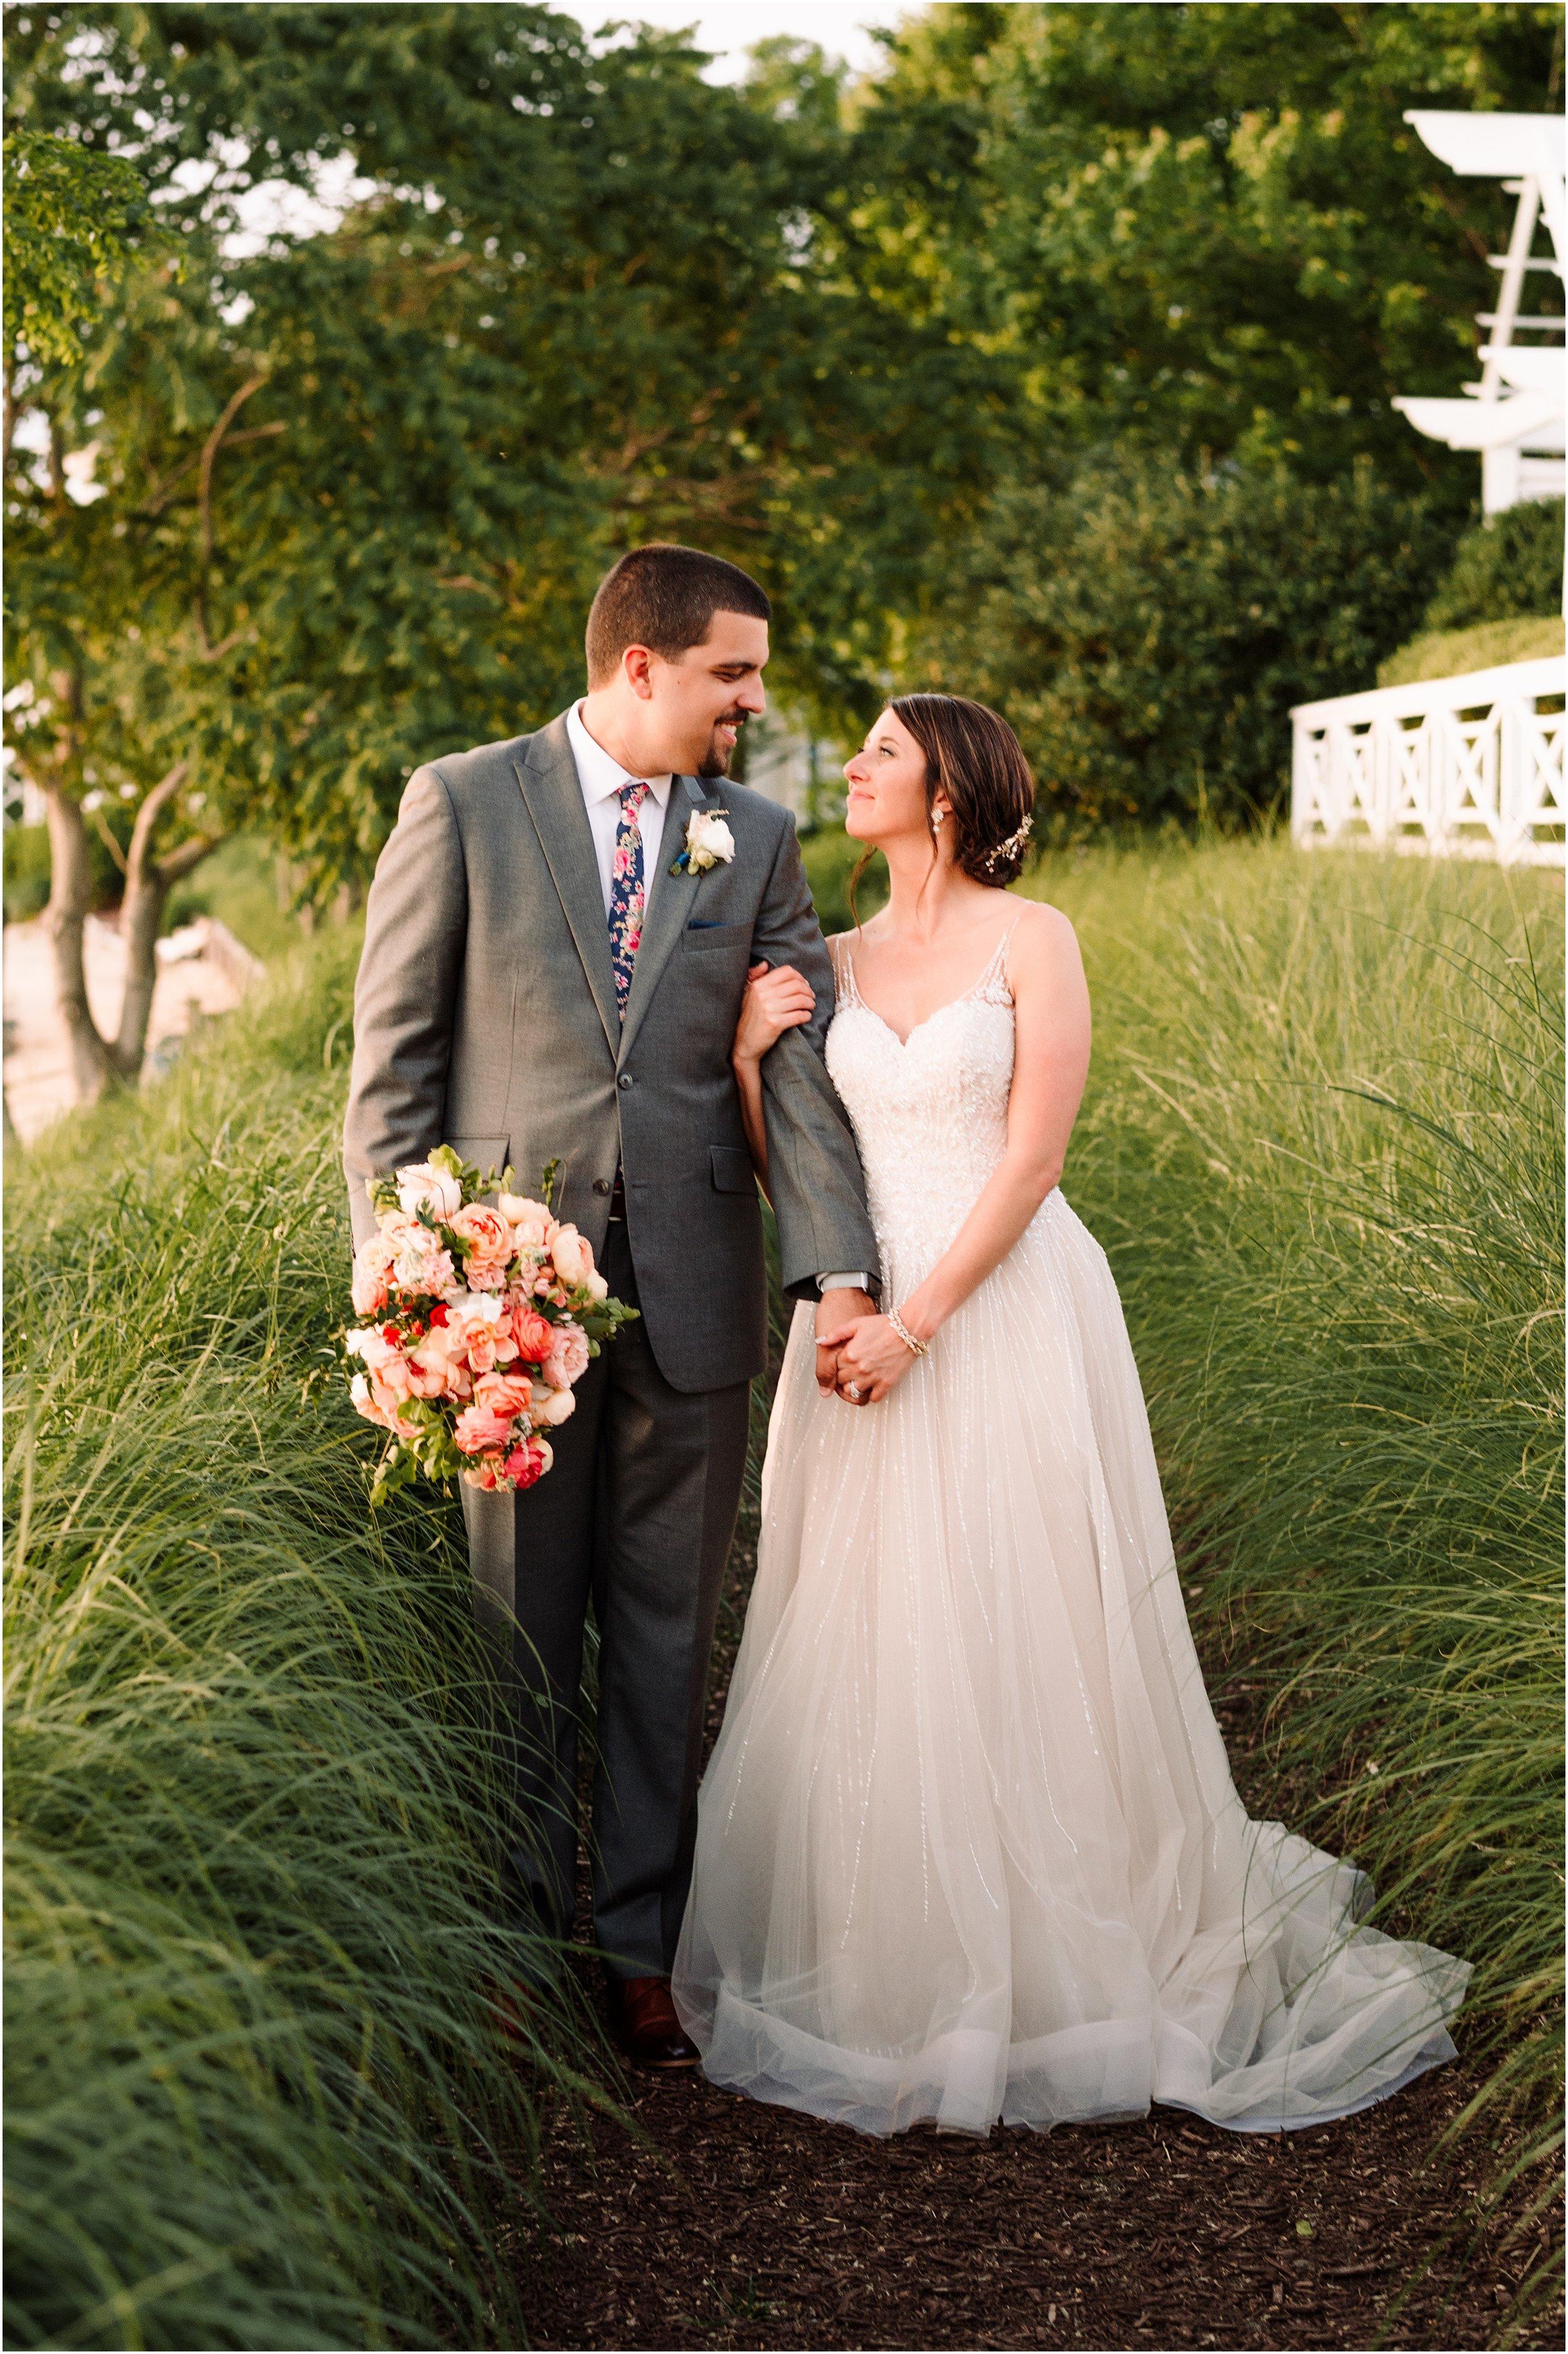 hannah leigh photography chesapeake bay beach club wedding Stevensville MD_3129.jpg